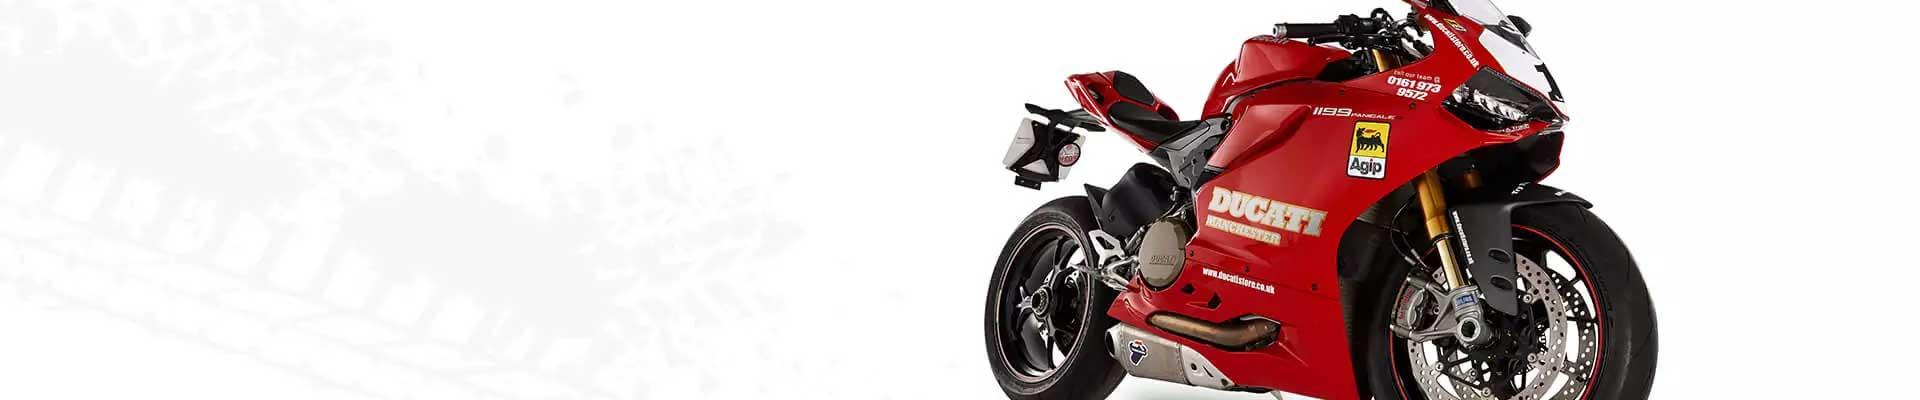 performance-bike-ducati